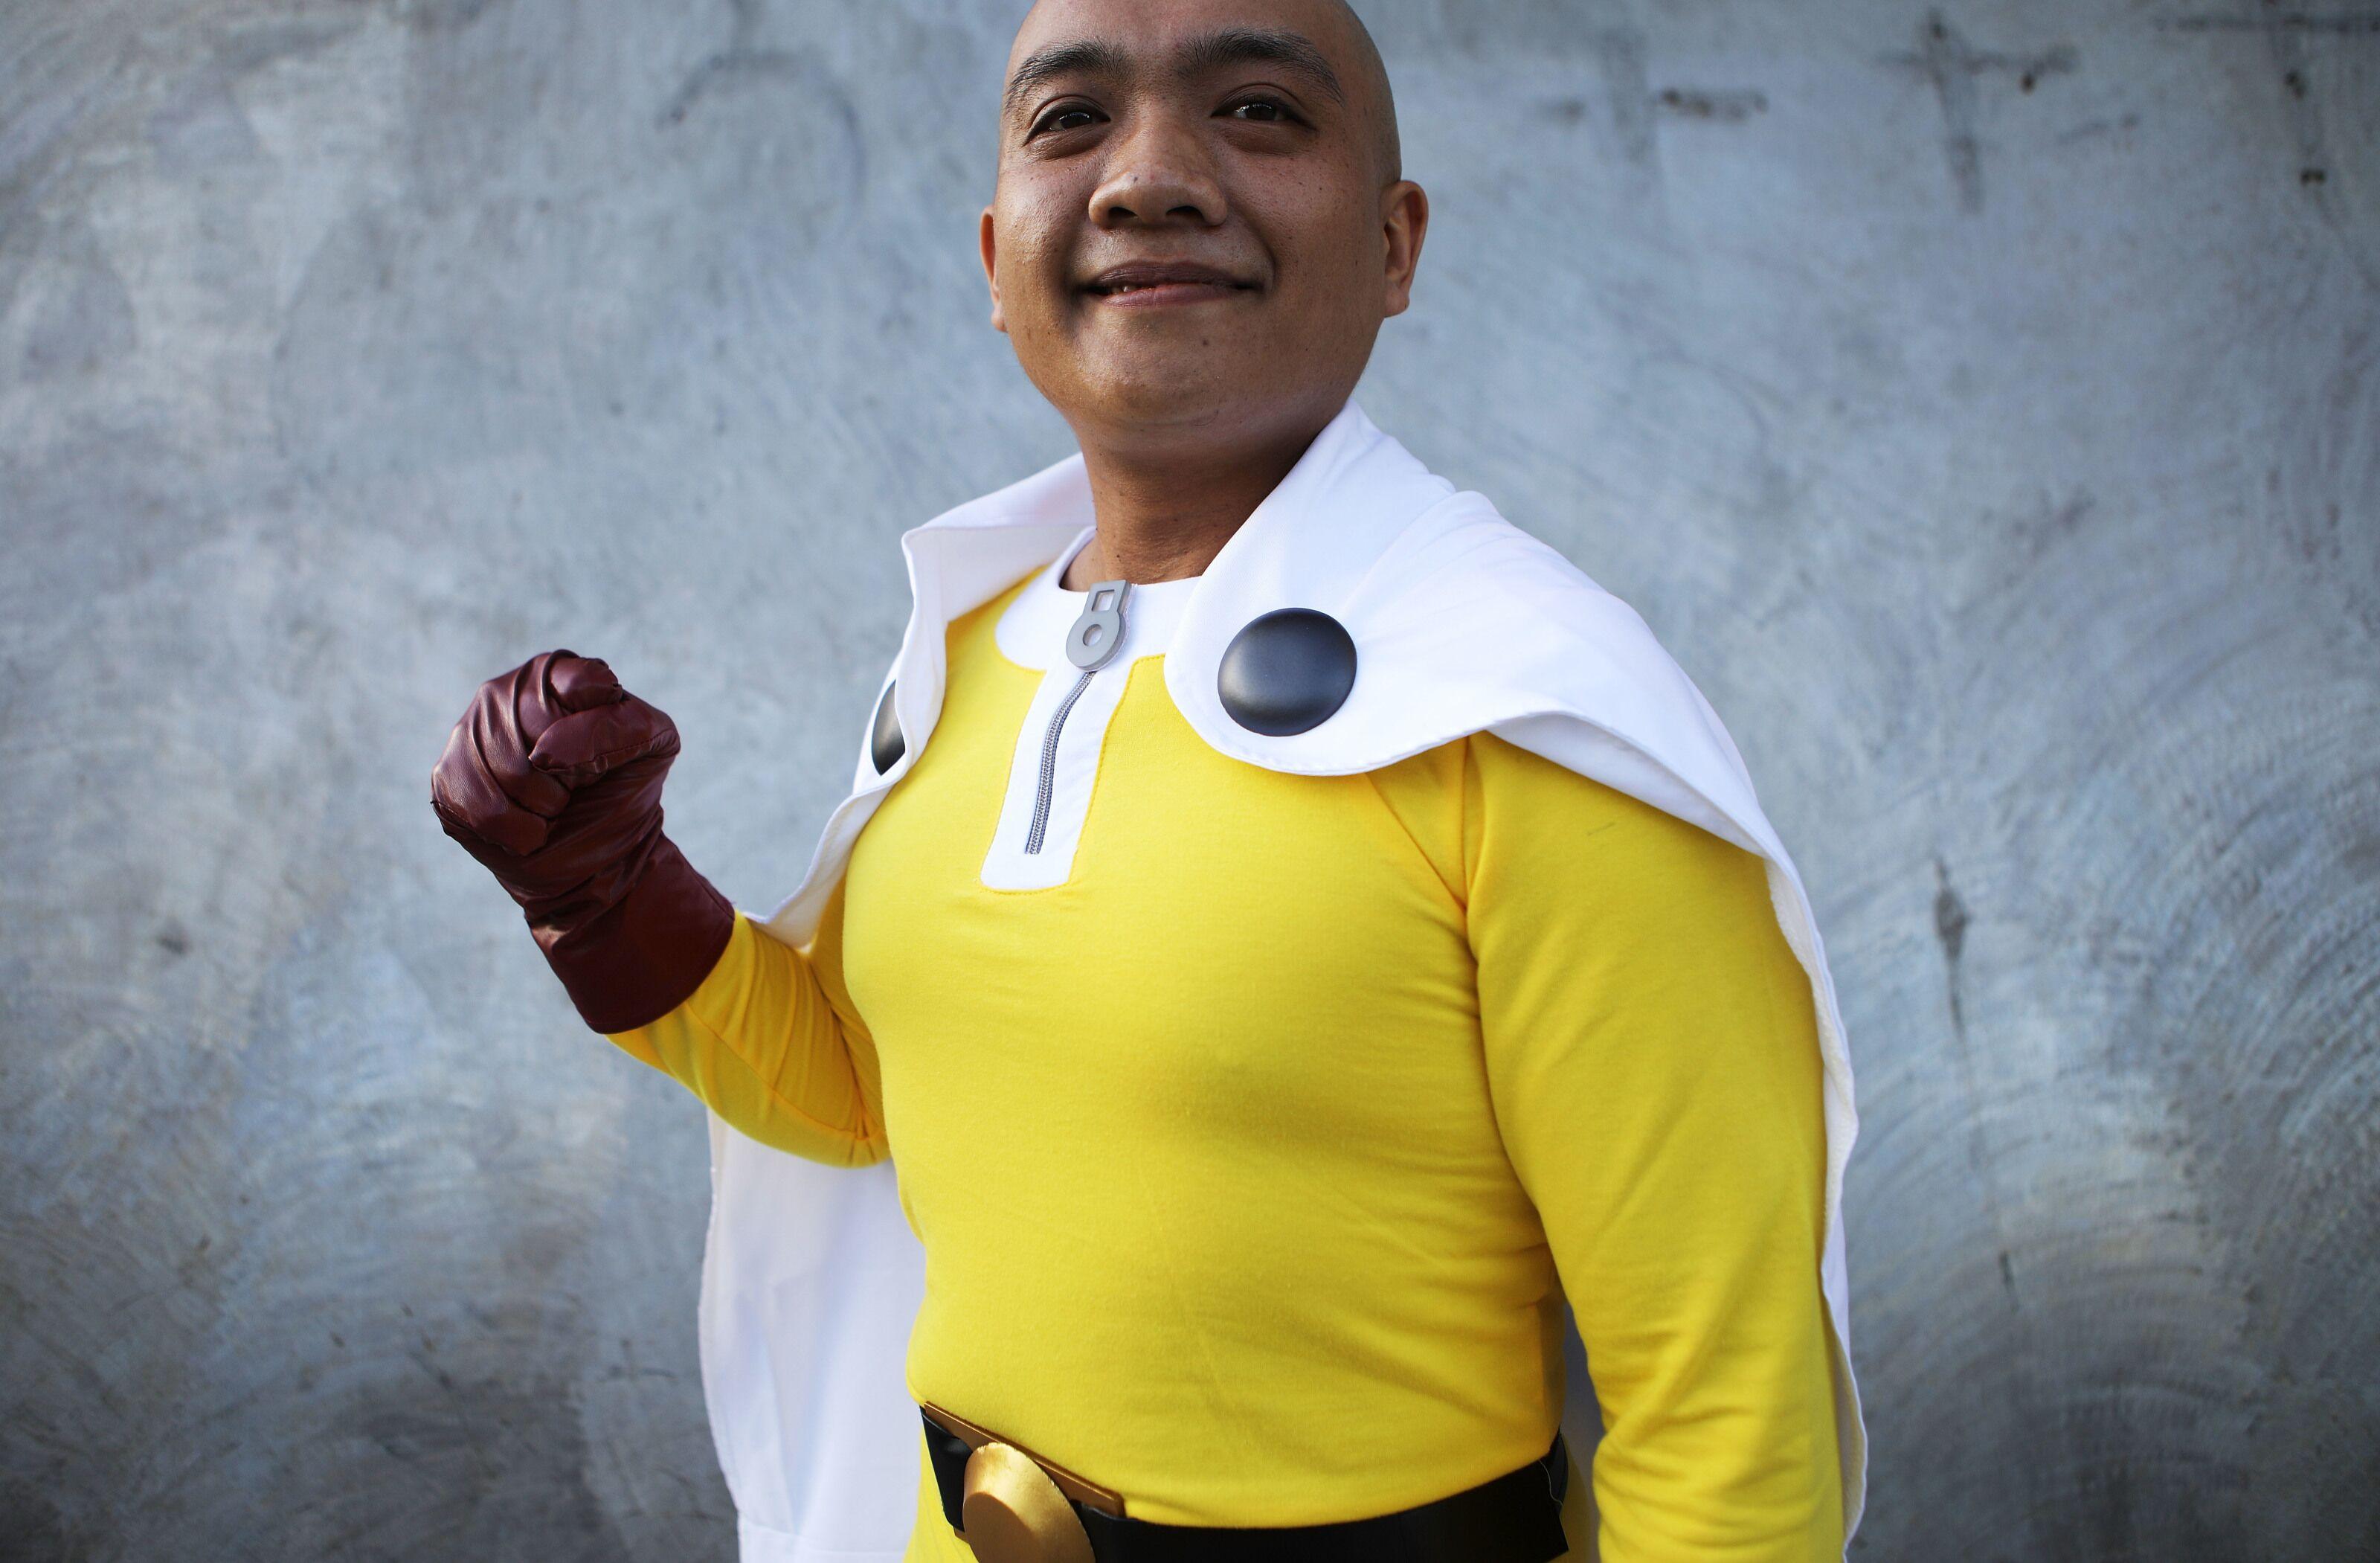 One Punch Man Season 2 announcement and villain reveal